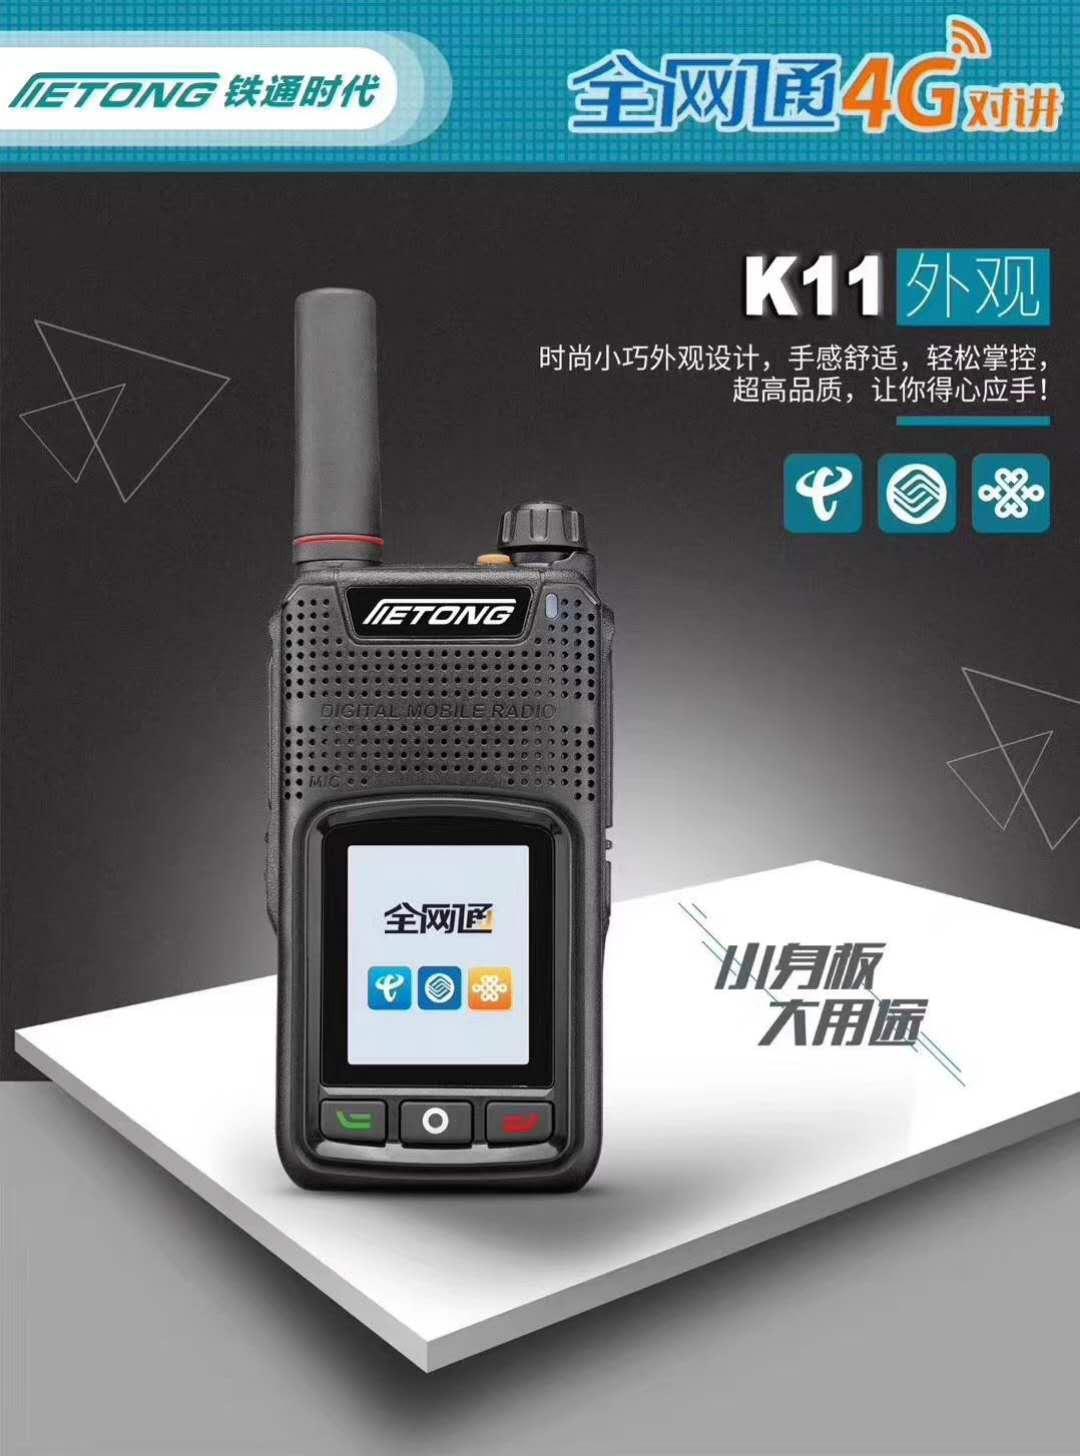 K11图片.jpg